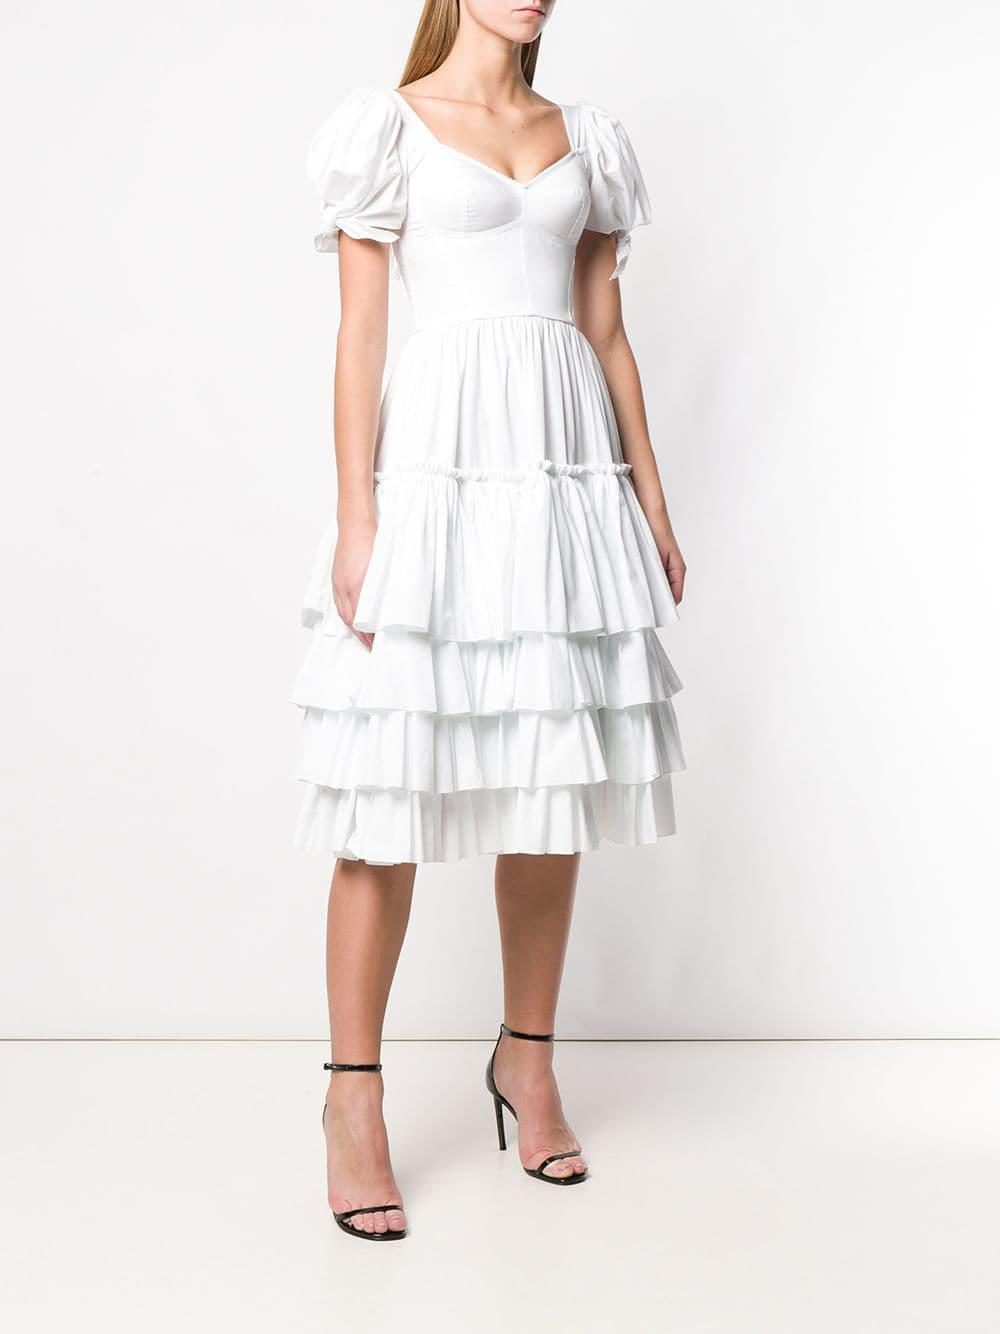 584aa535775 Dolce   Gabbana - White Ruffled Poplin Dress - Lyst. View fullscreen